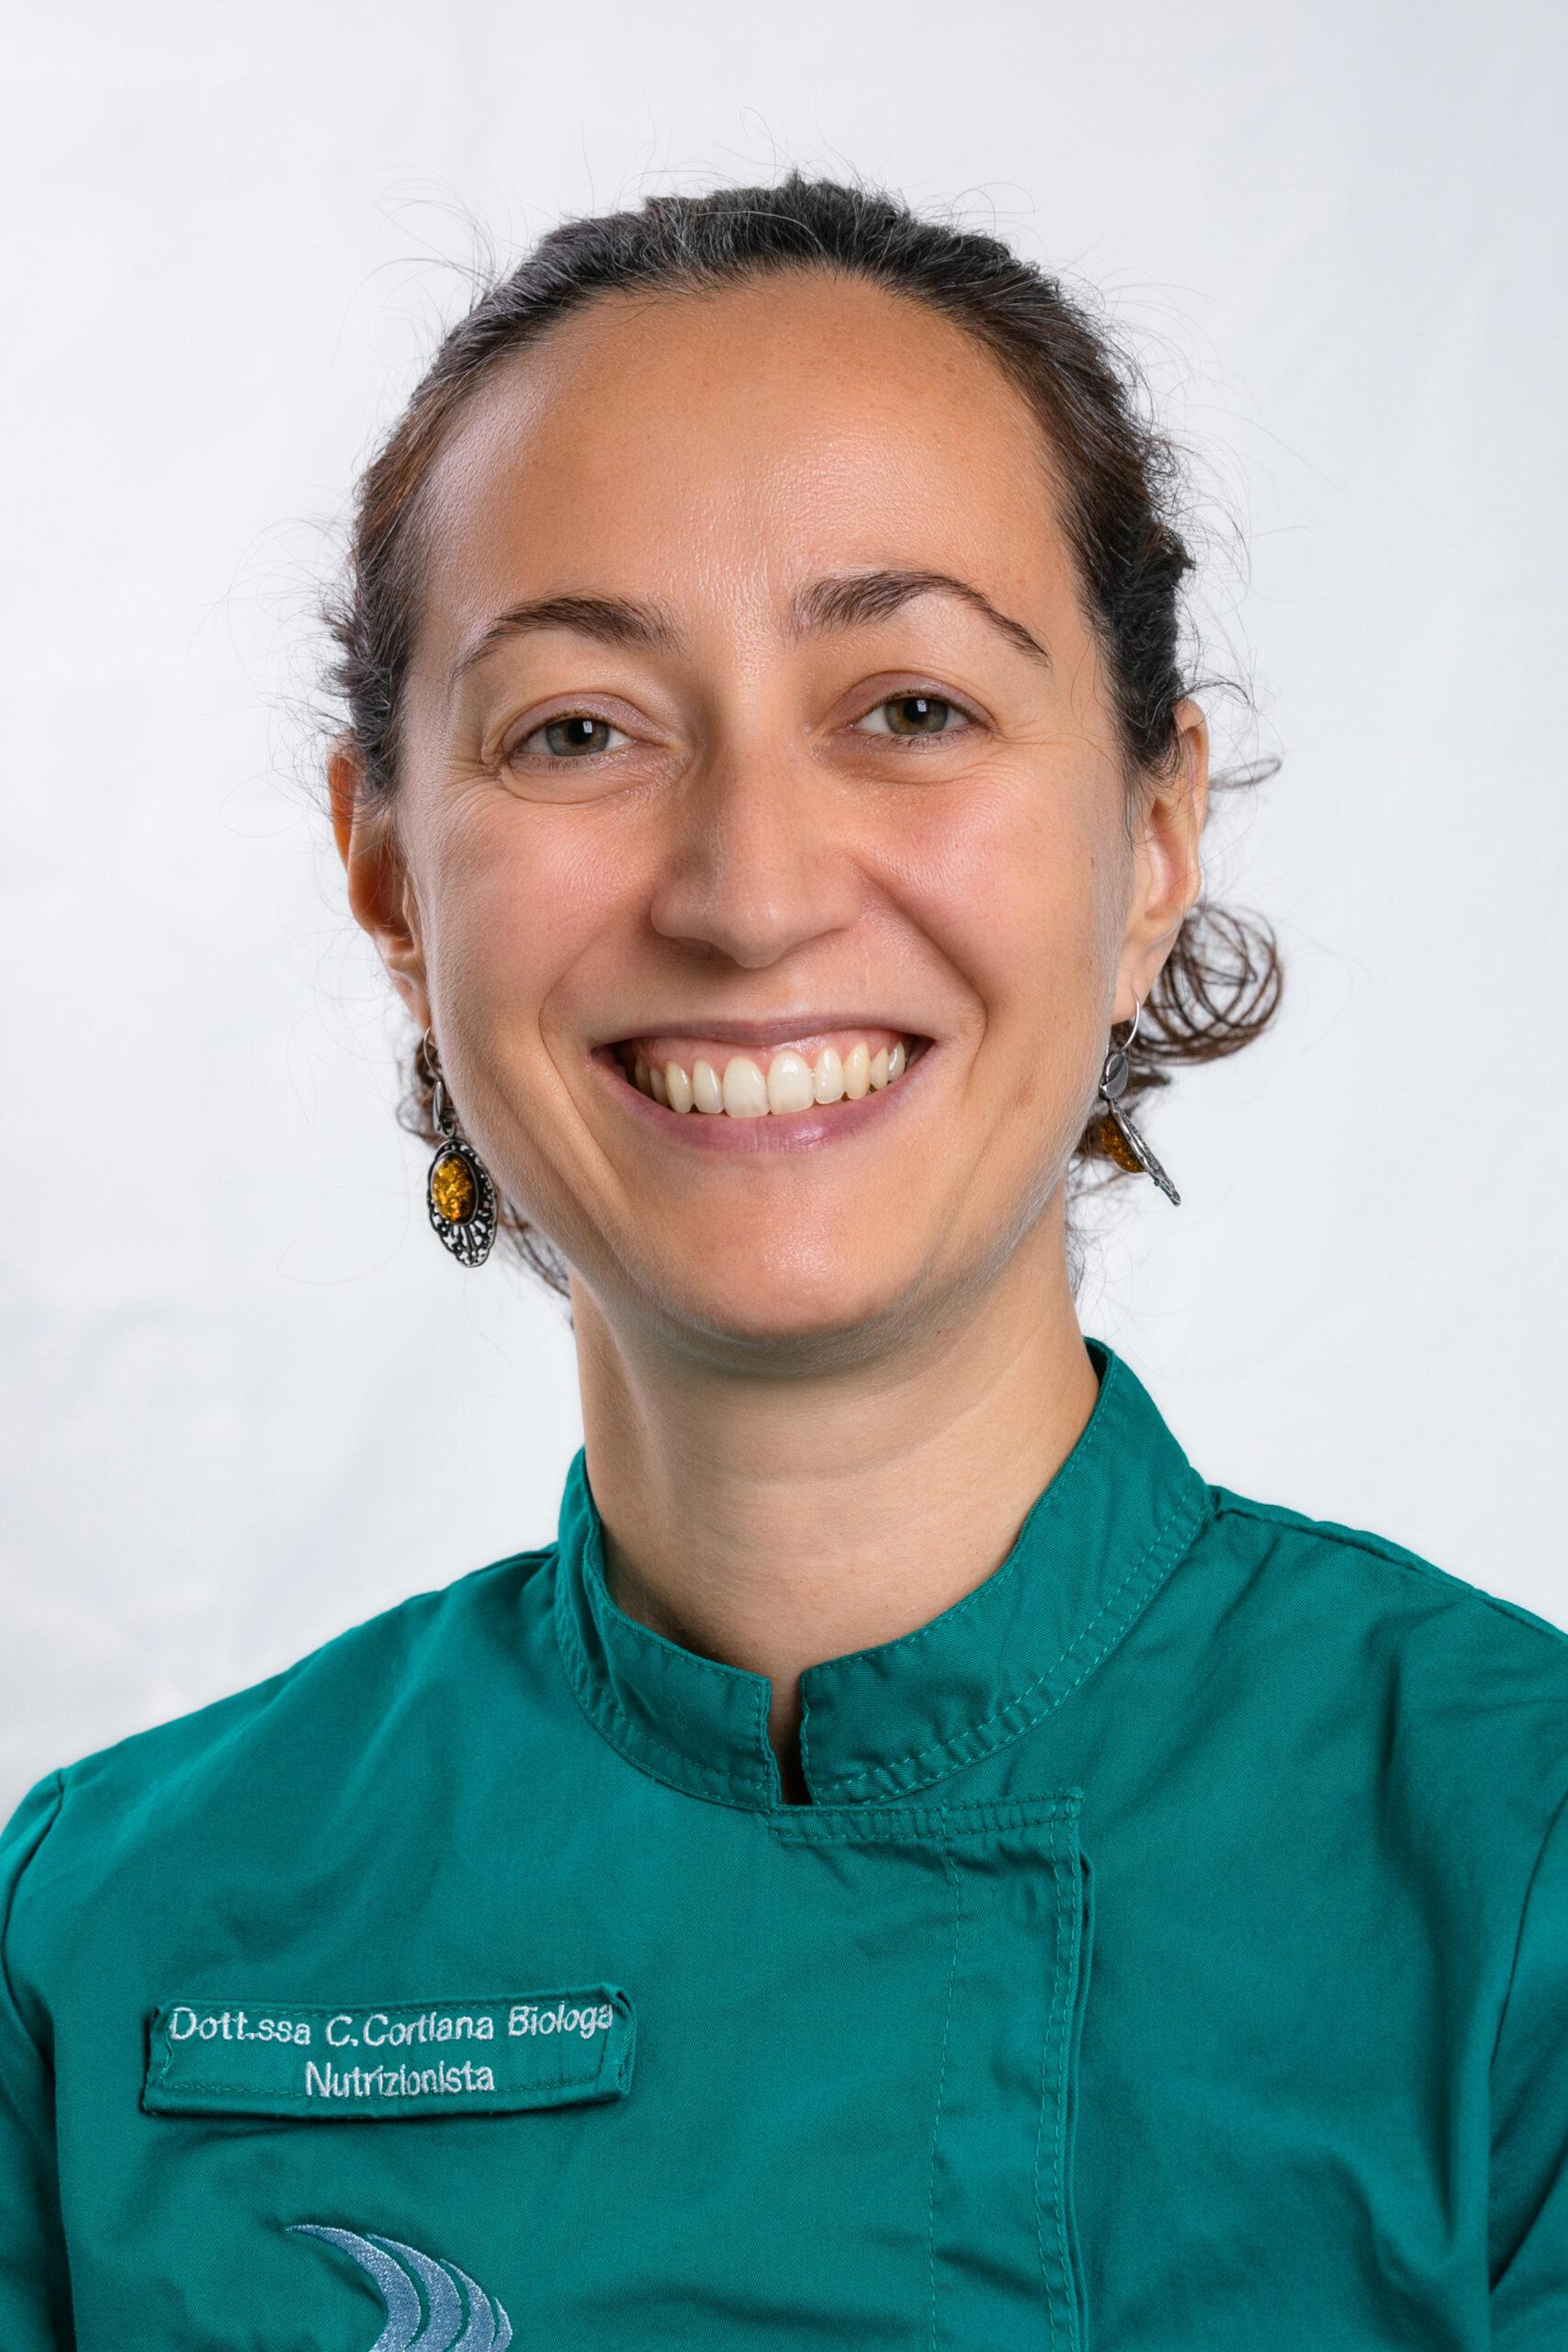 Dott.ssa Chiara Cortiana